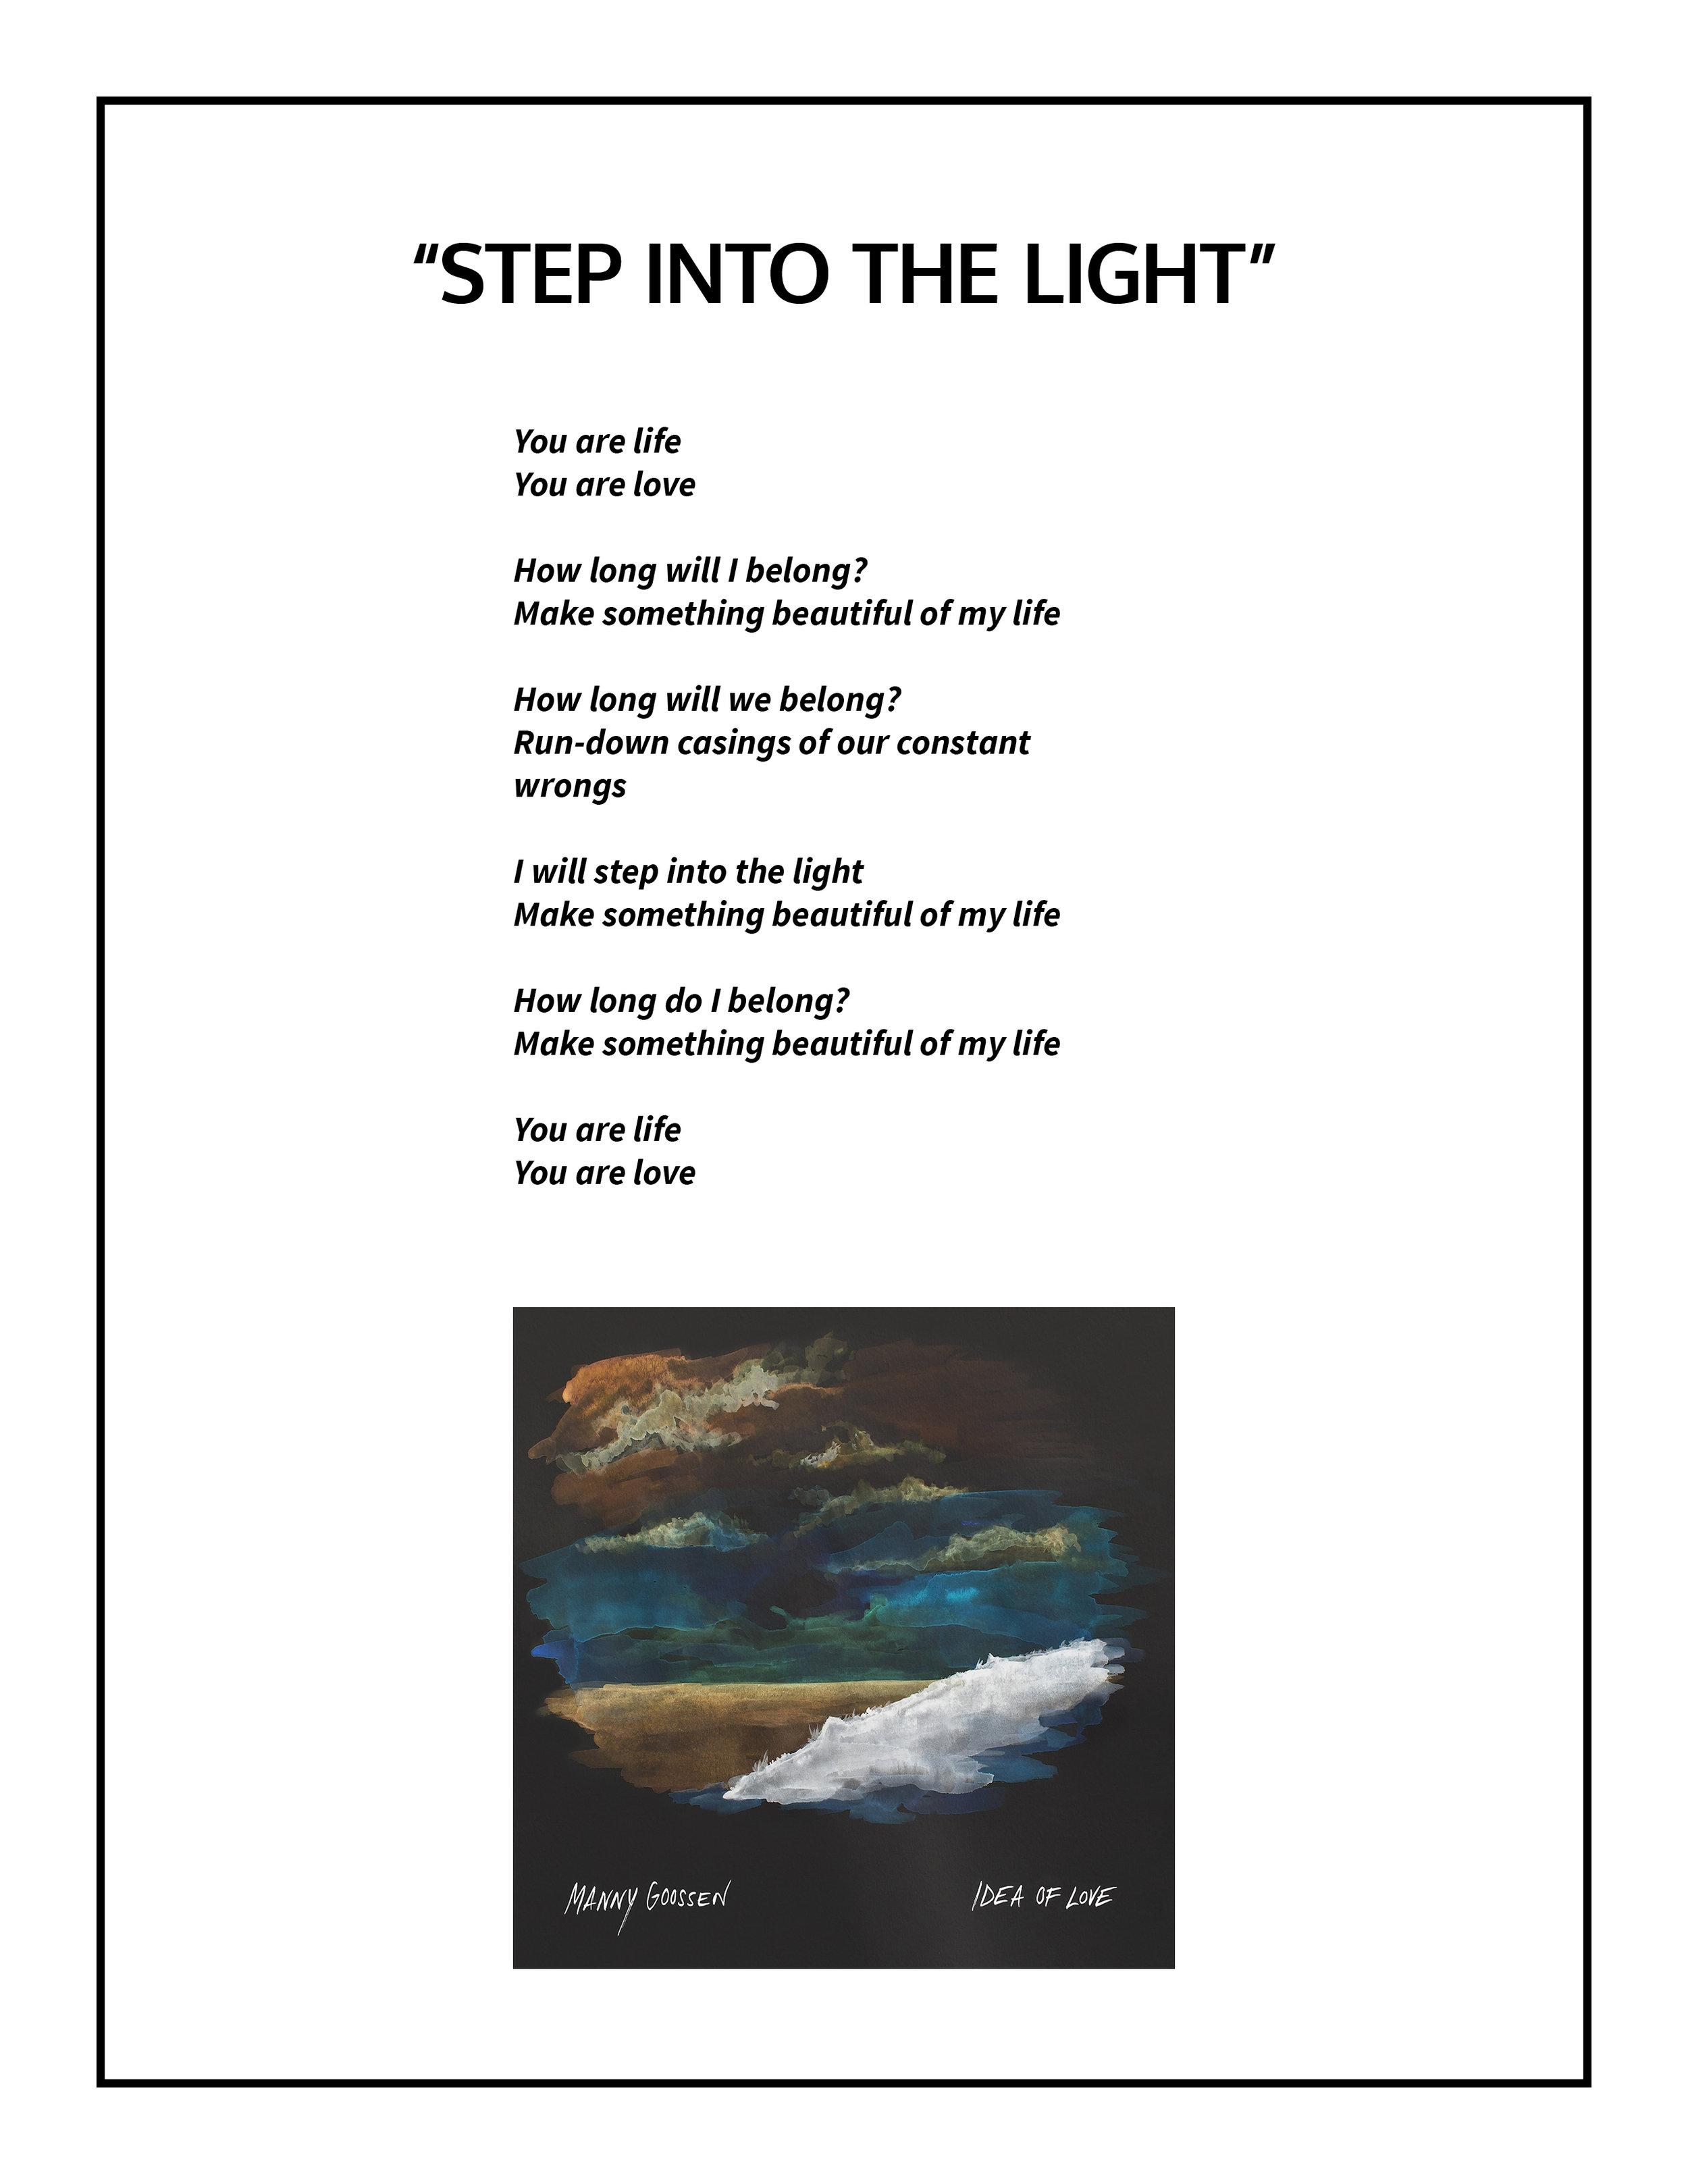 Step Into the Light Lyrics